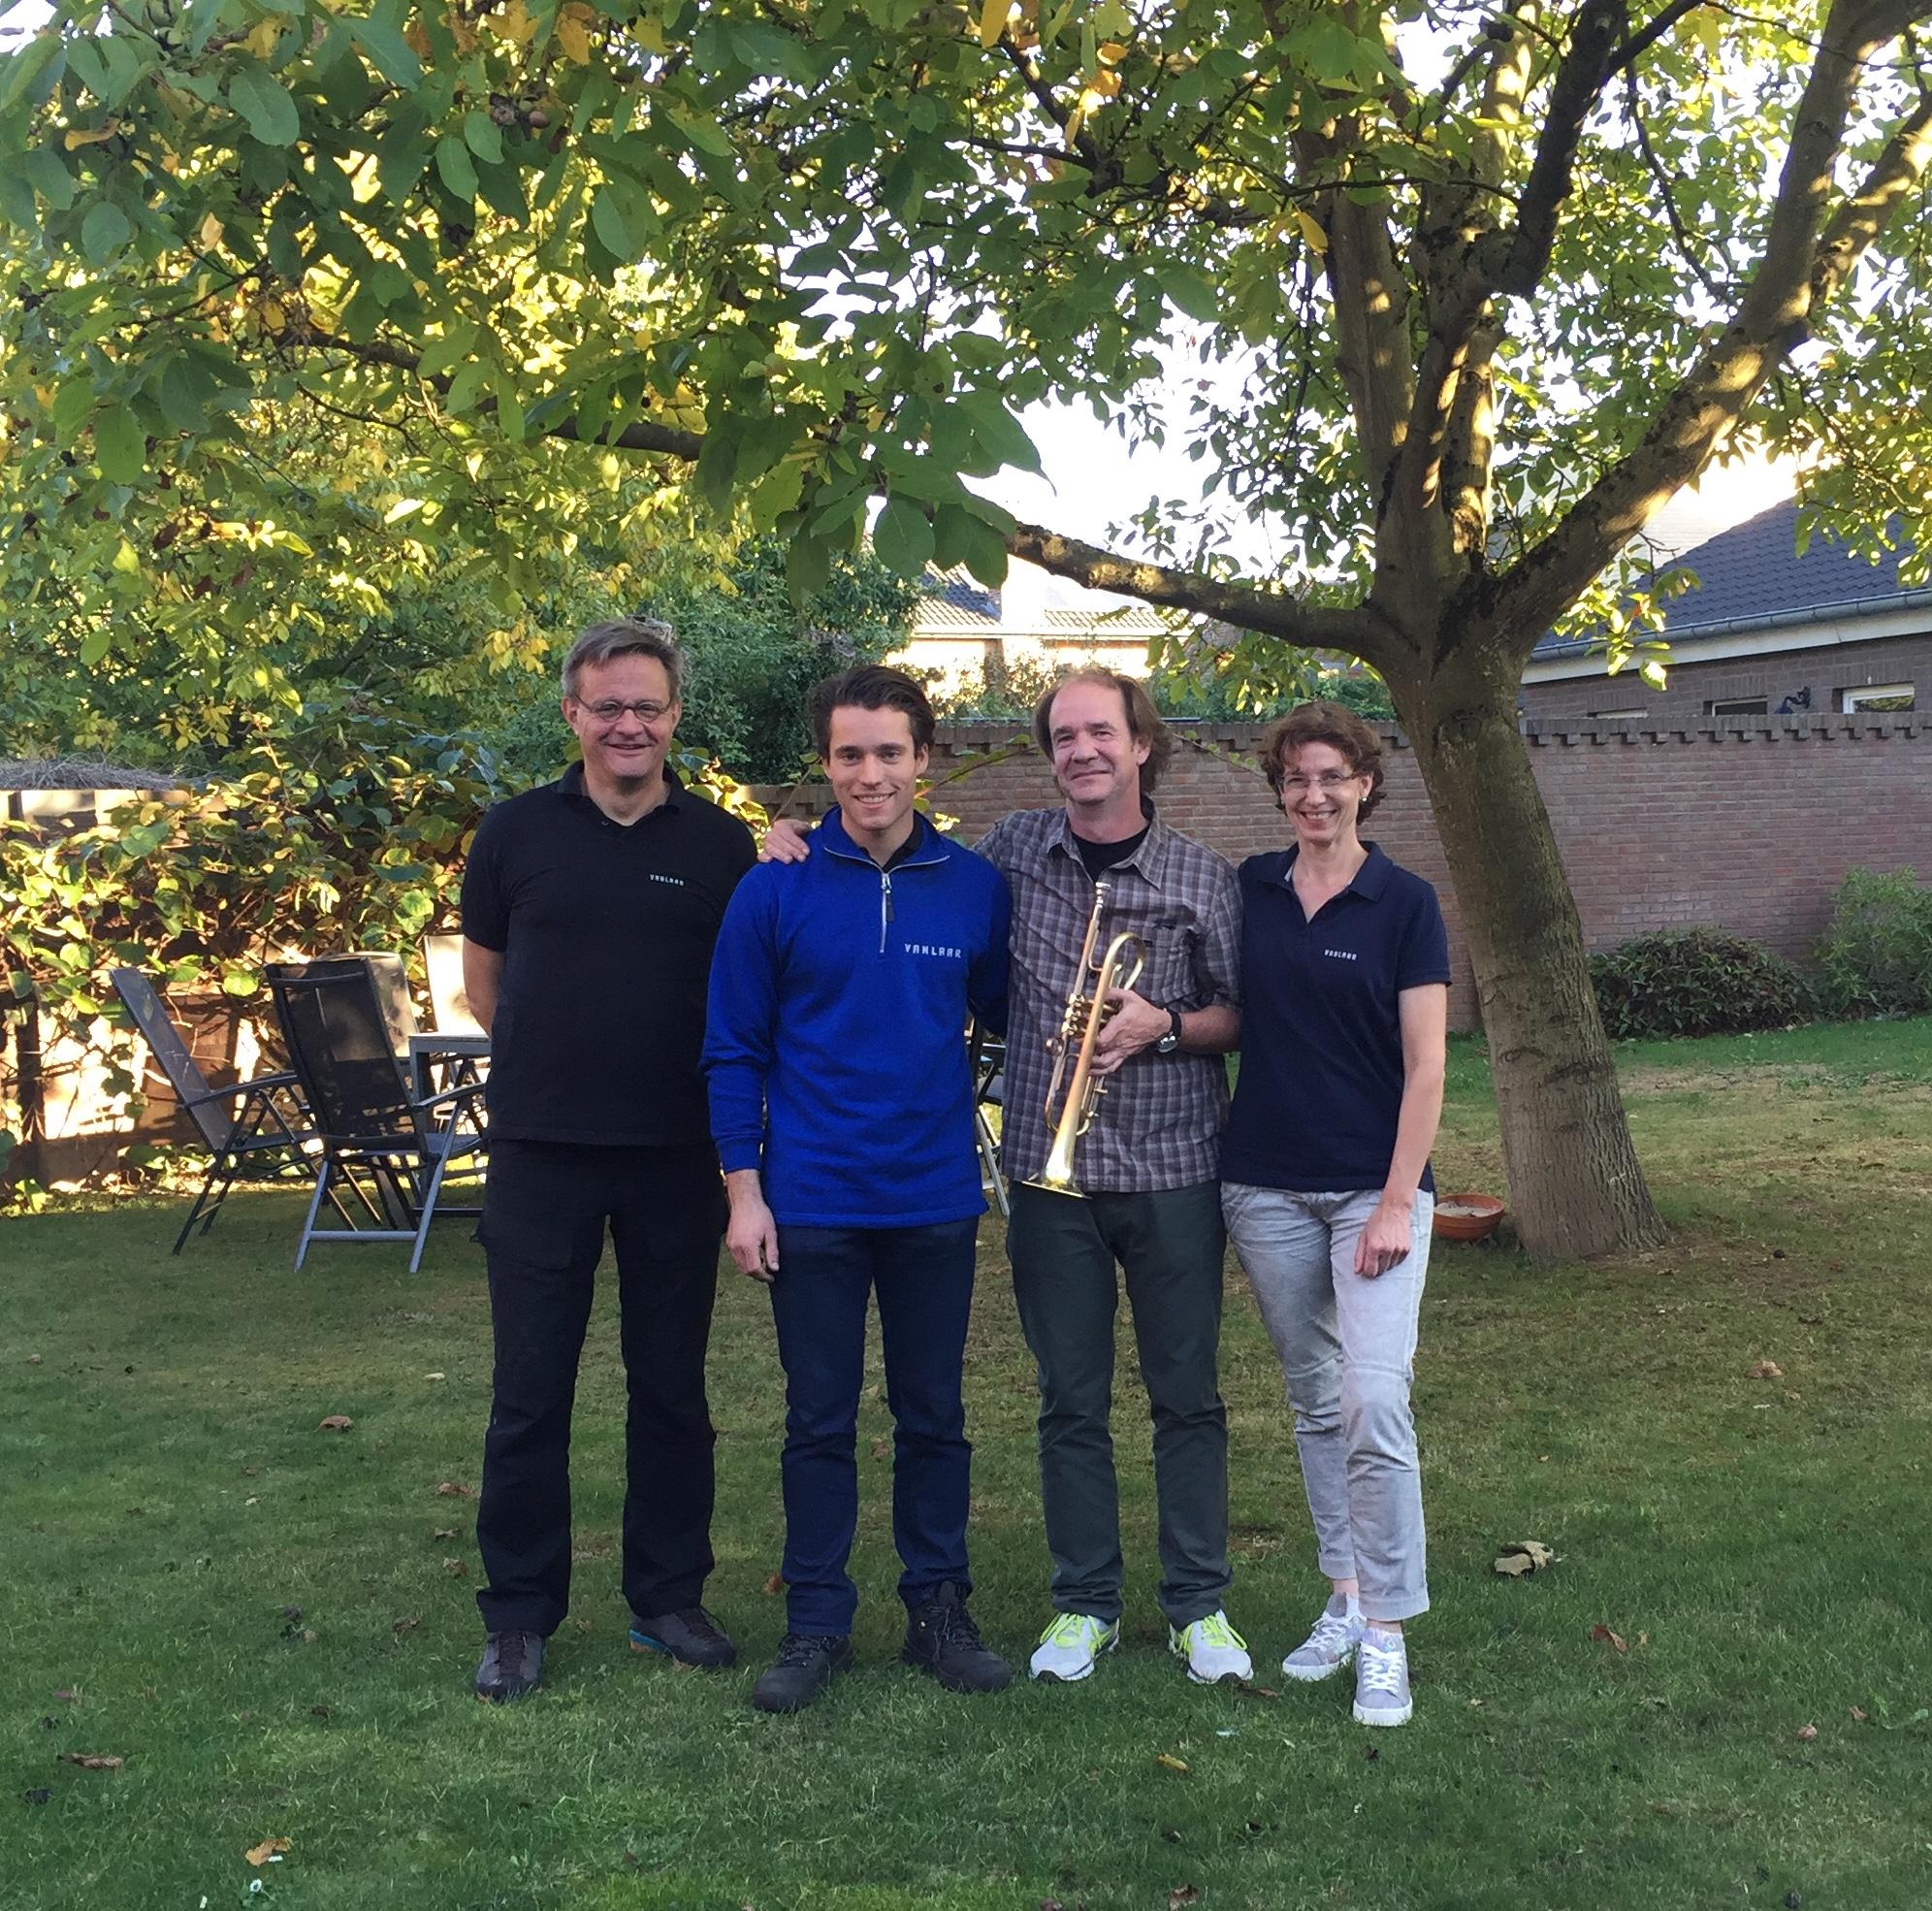 Hub van Laar, Yannic Roijen, Chris Kase and Heidrun Joechner